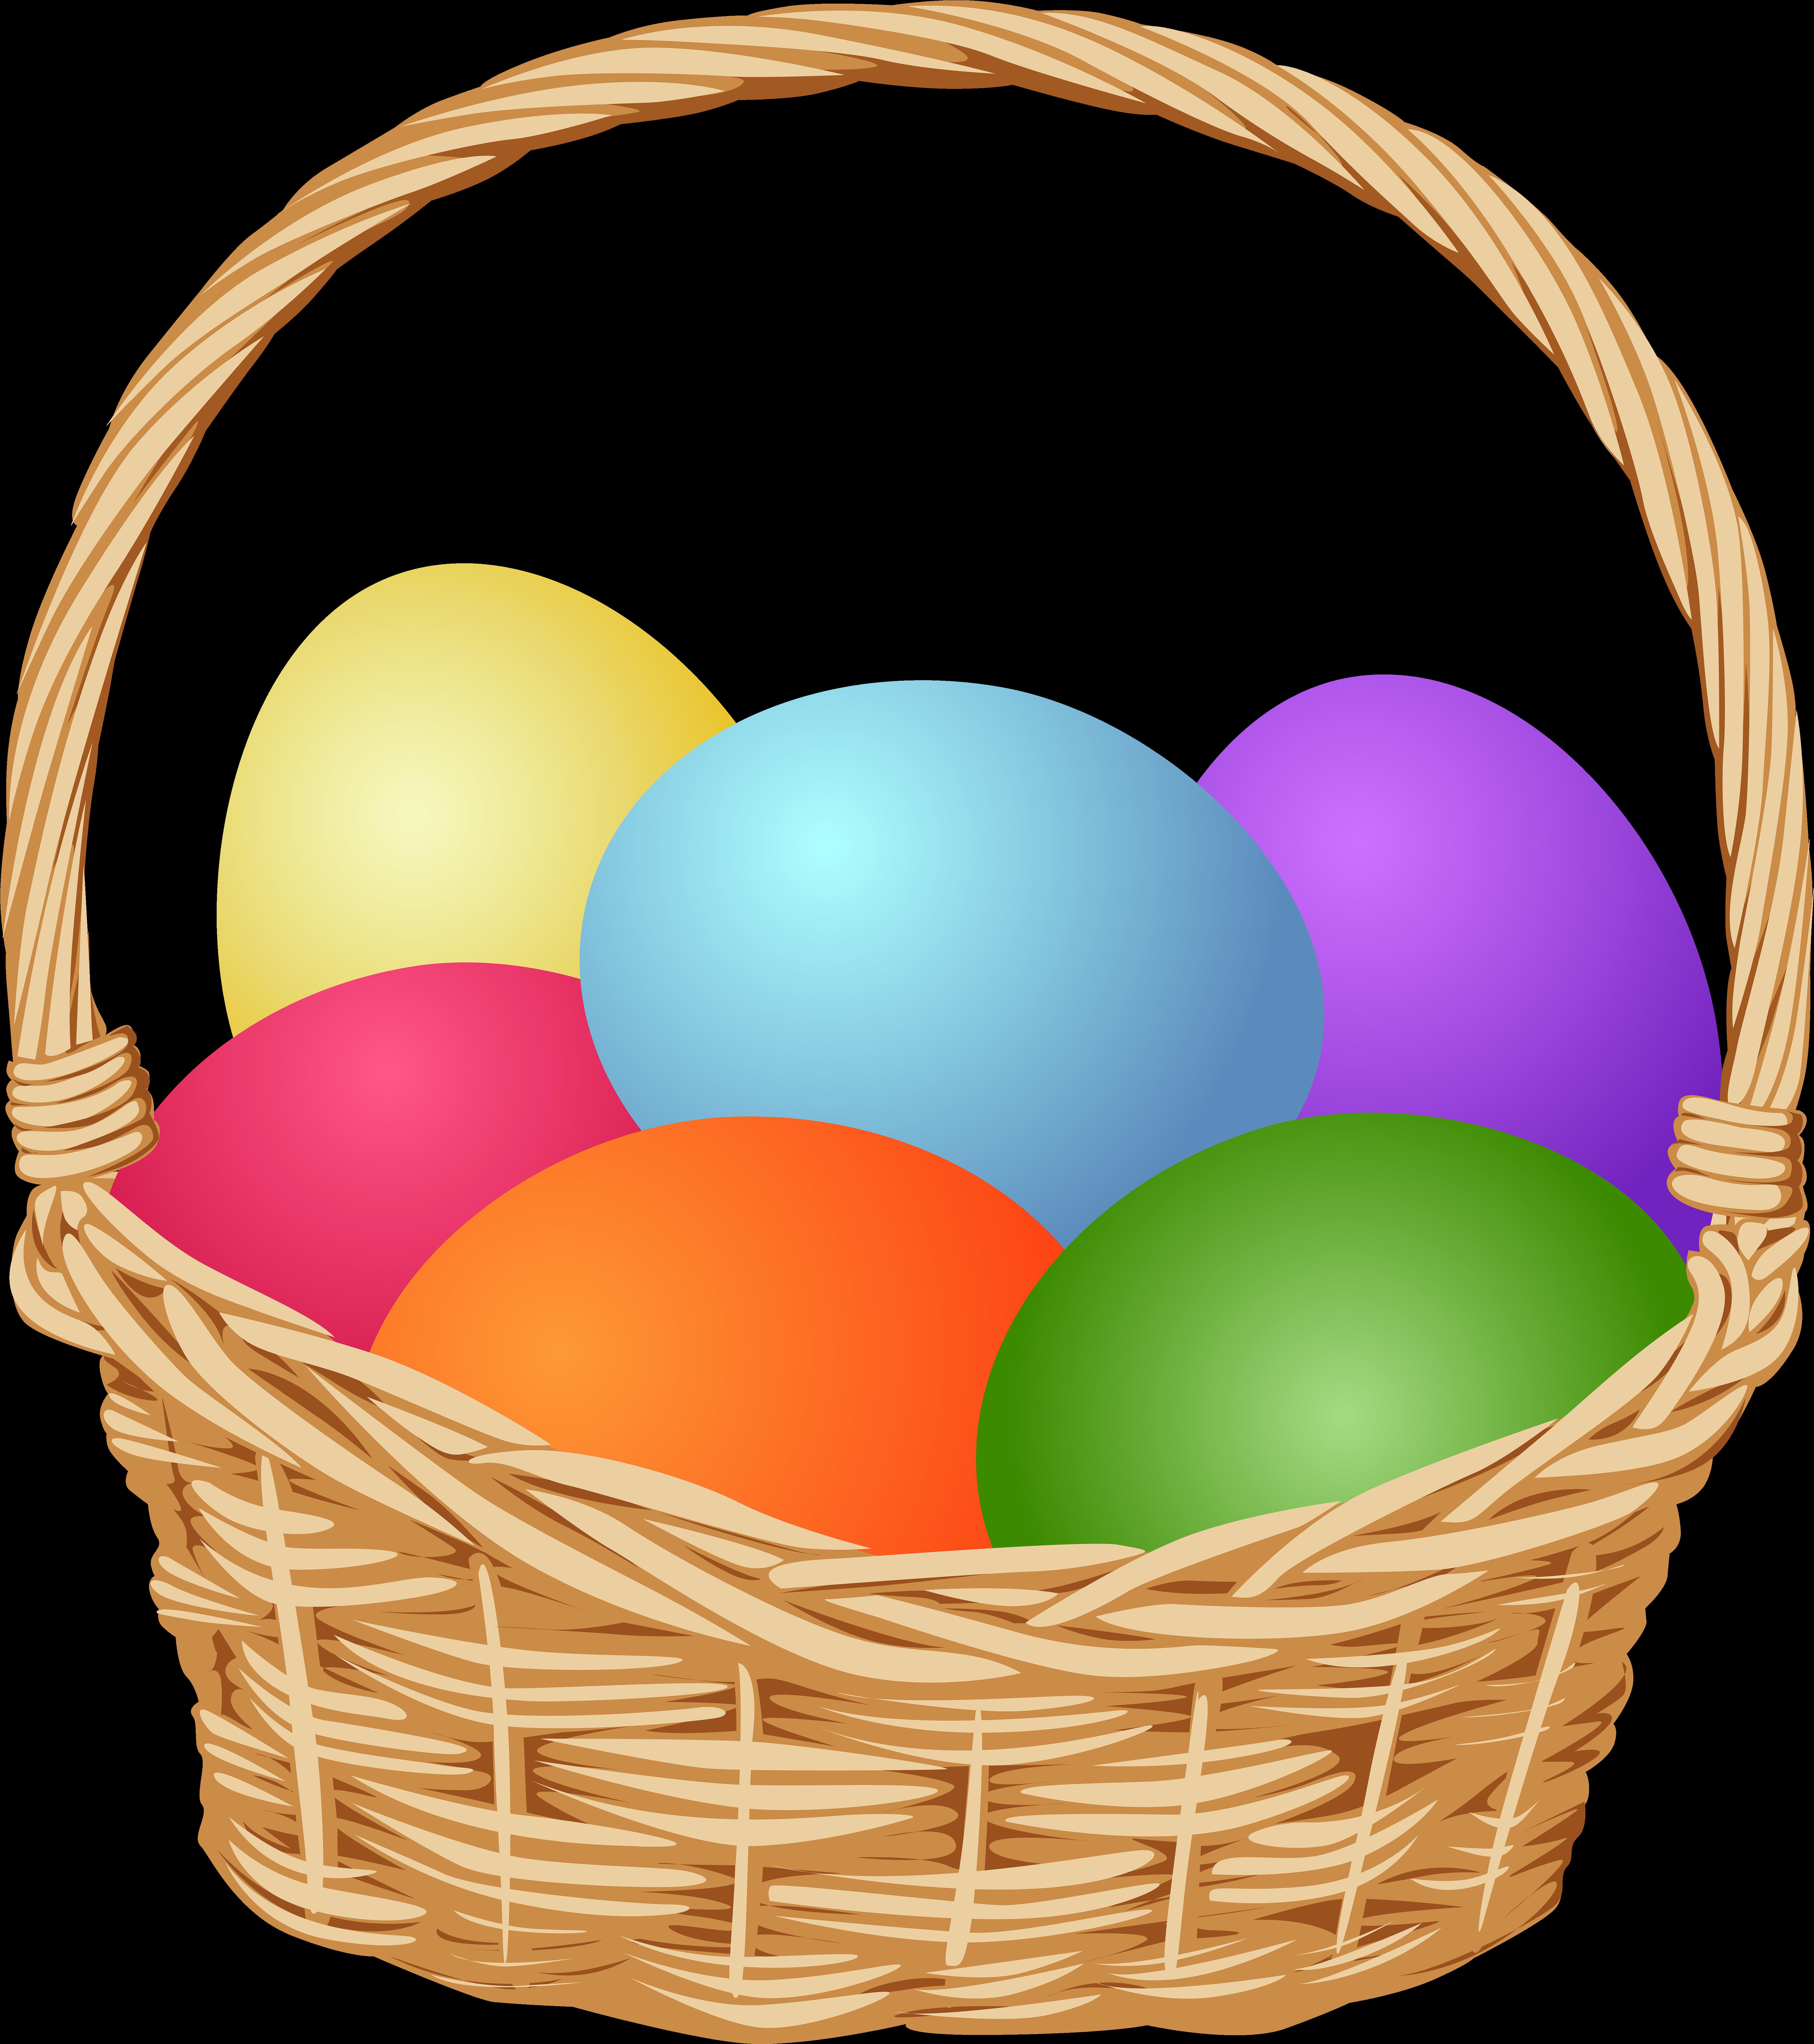 easter egg basket clipart 19 free Cliparts | Download ...